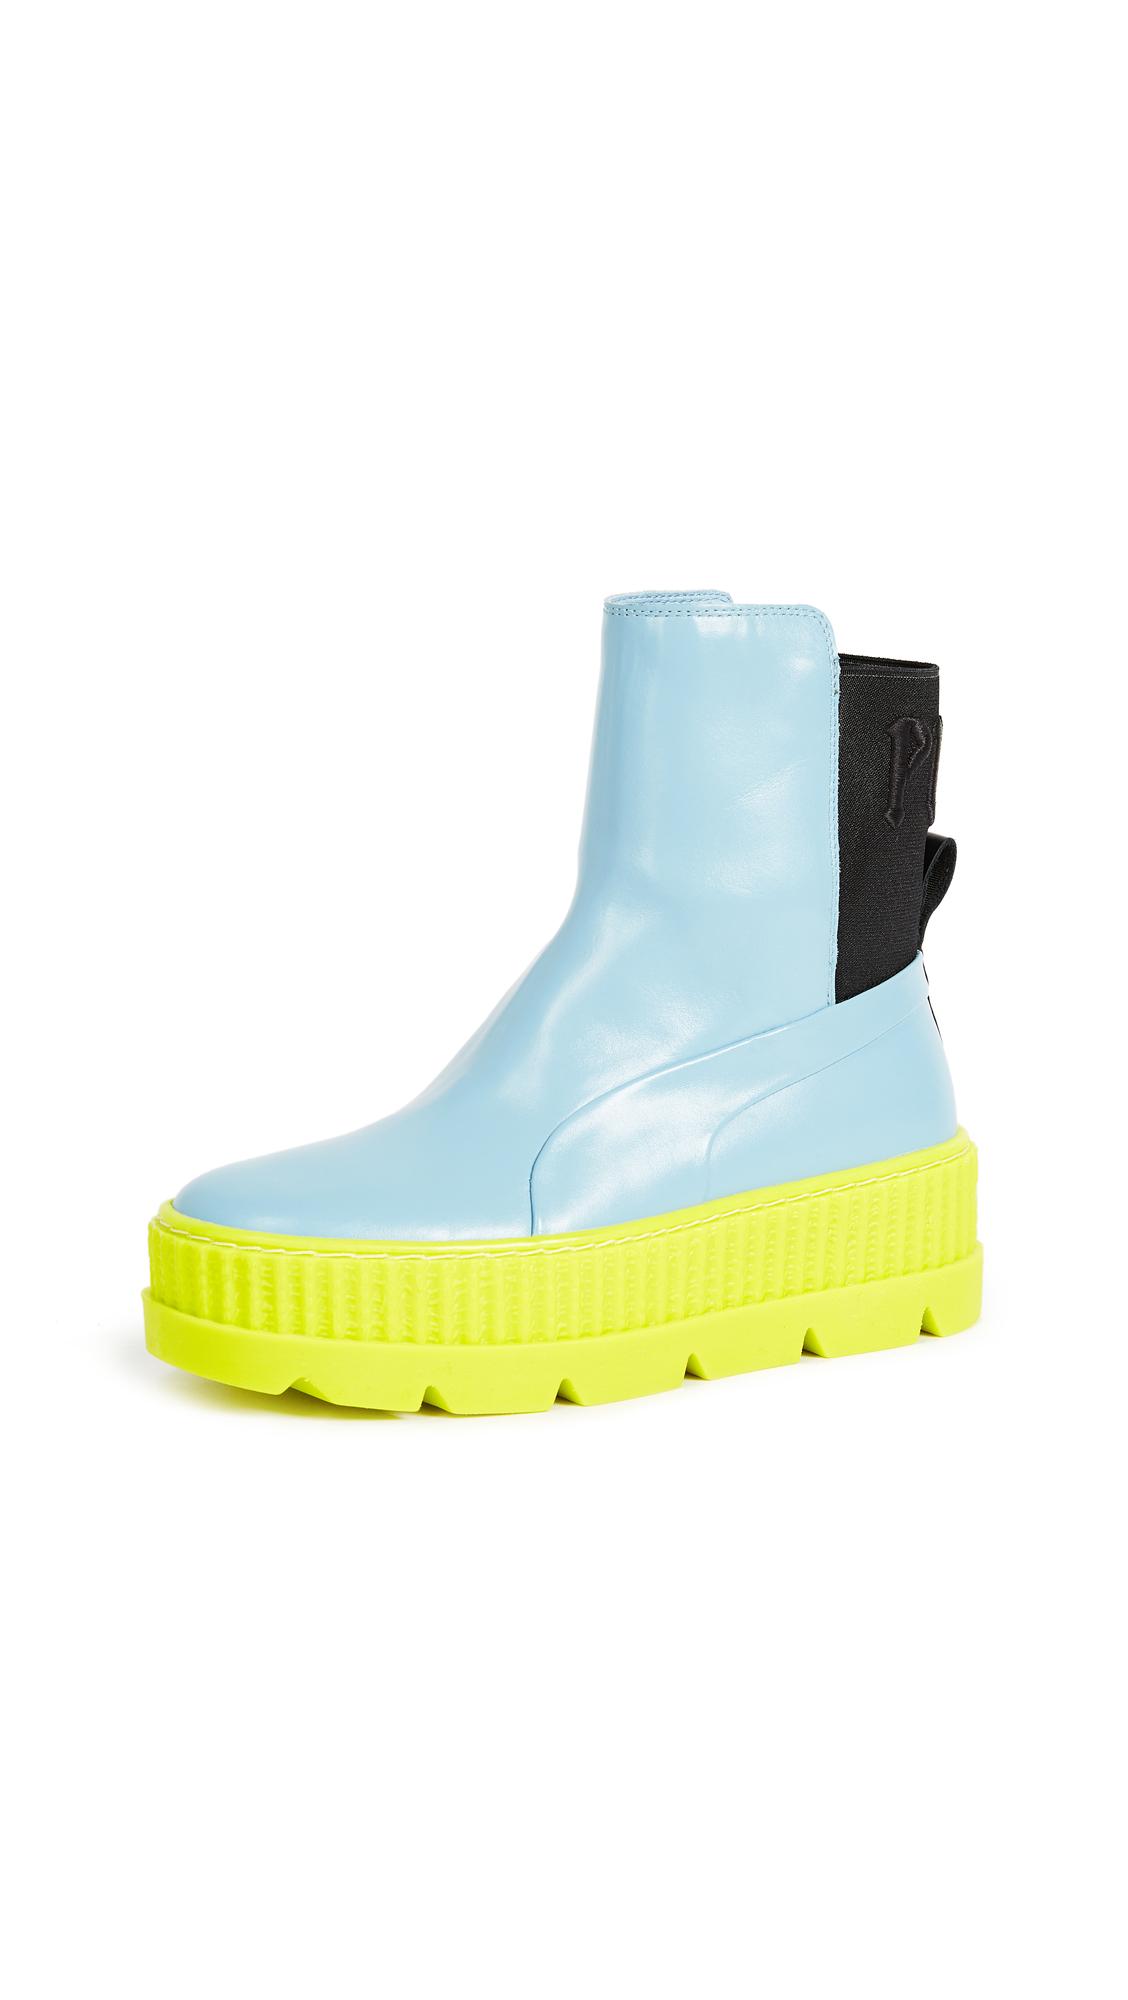 PUMA FENTY x PUMA Chelsea Sneaker Boots - Sterling Blue/Black/Limeade